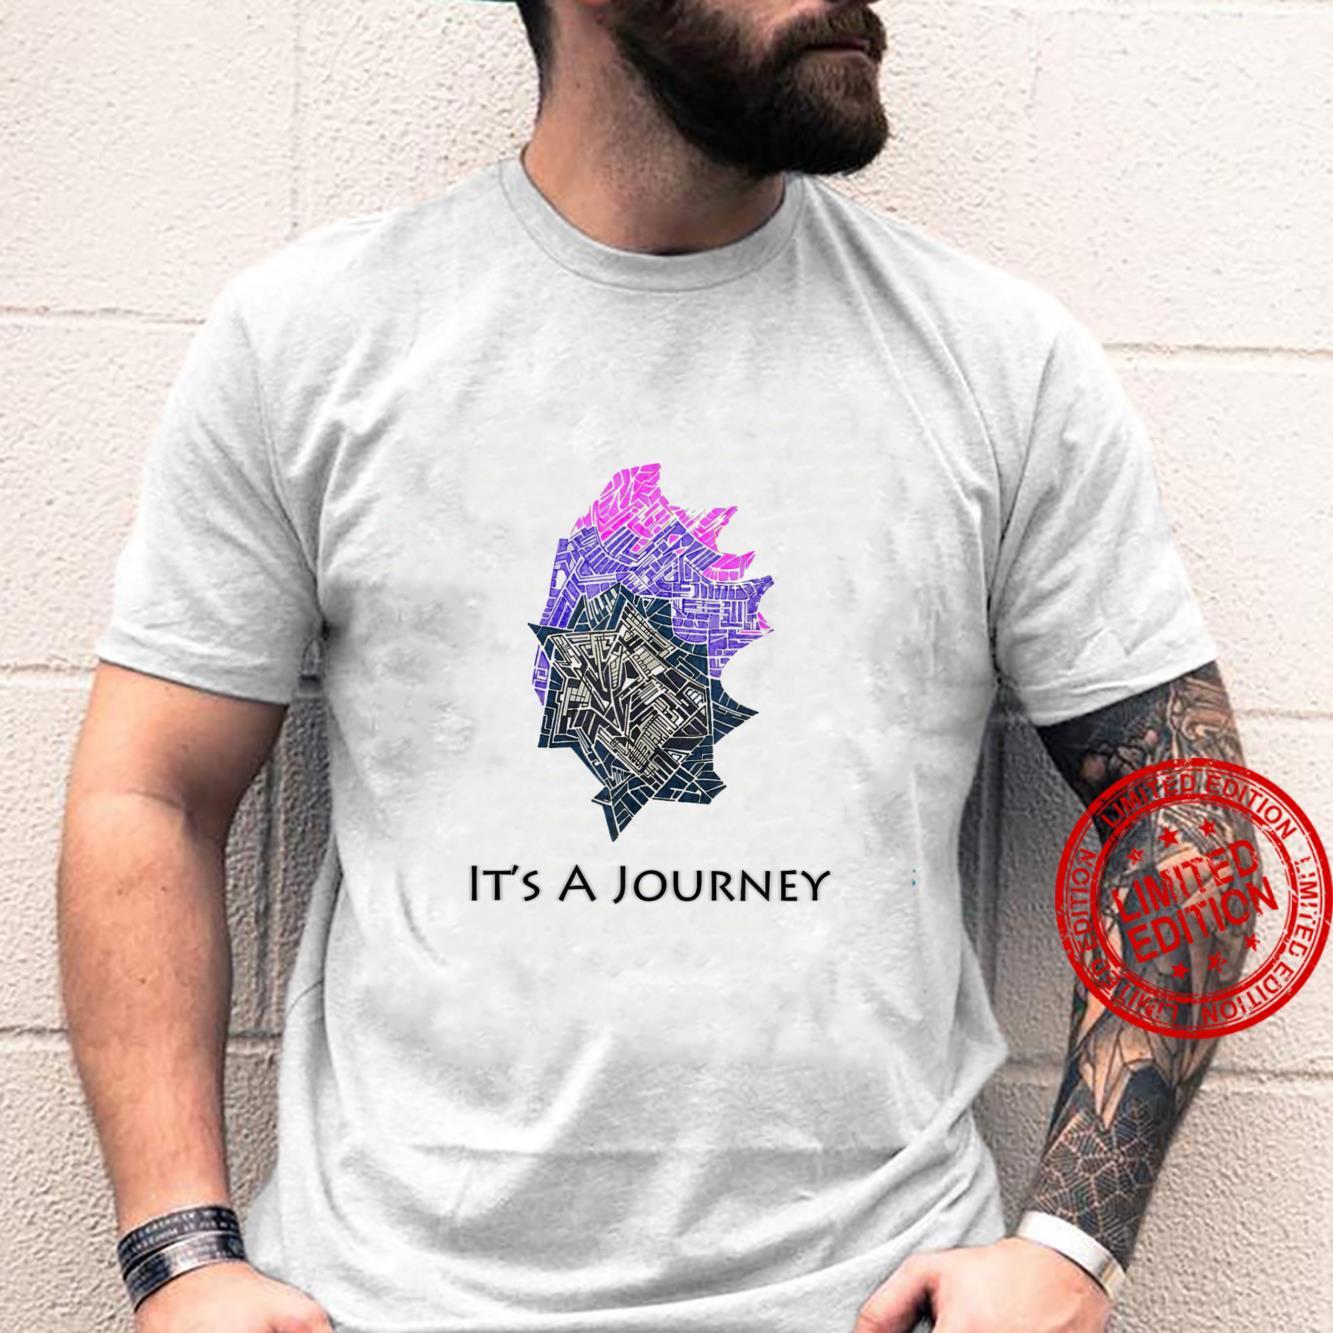 The Journey Shirt